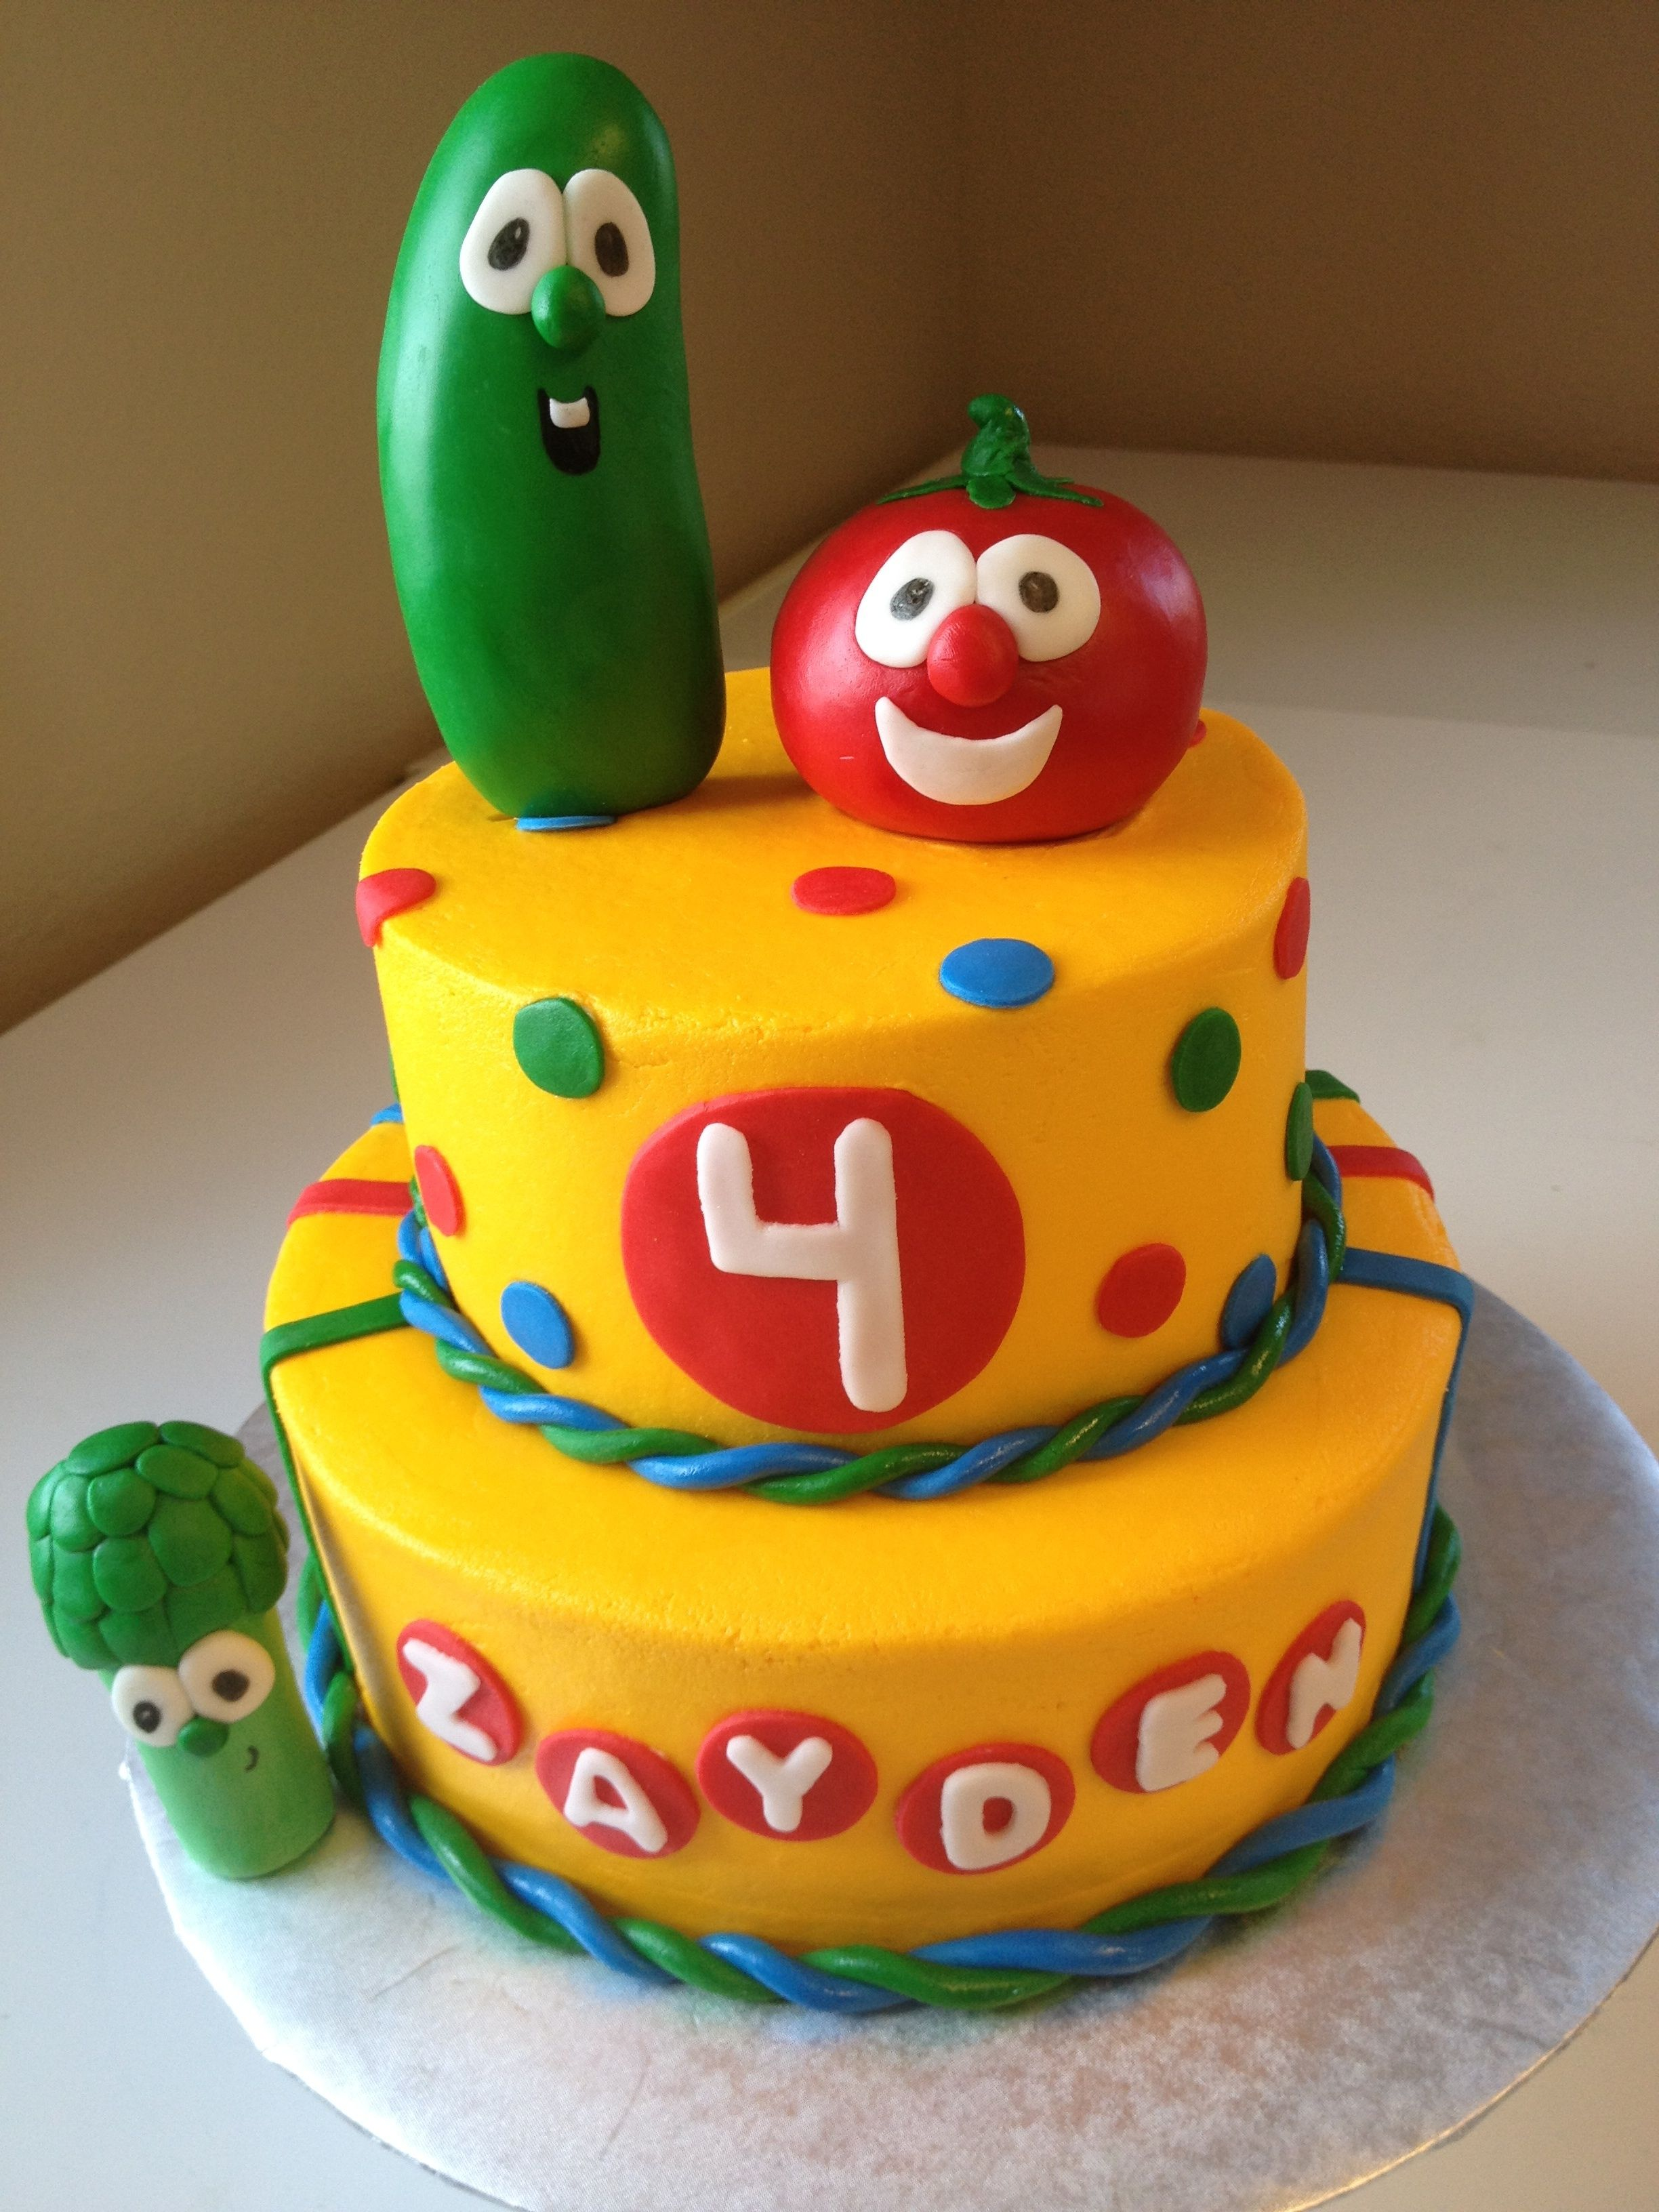 Swell Veggie Tales With Images Veggie Tales Cake Veggie Tales Personalised Birthday Cards Veneteletsinfo